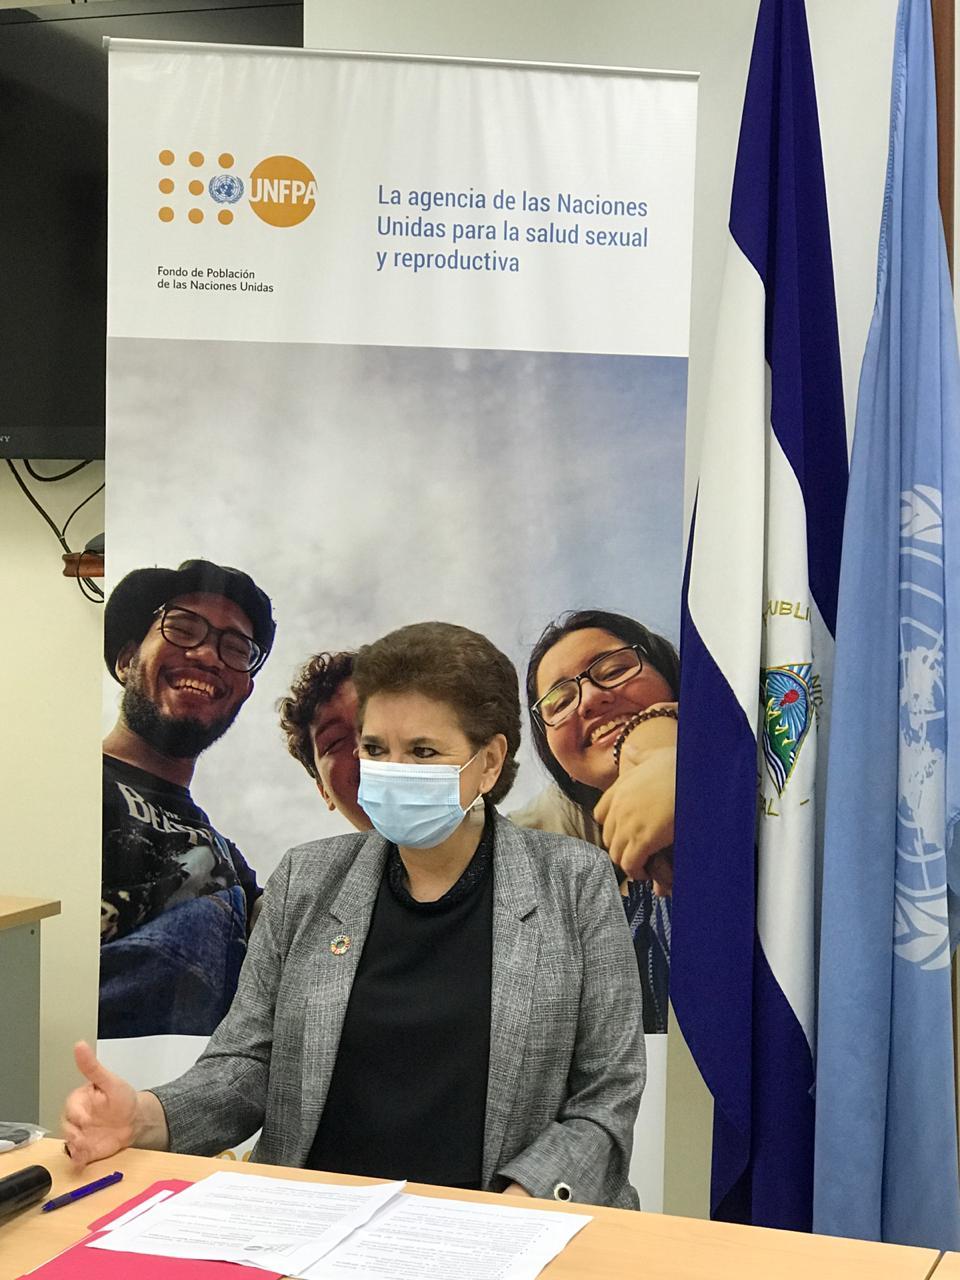 Elena Zúñiga, Representante UNFPA Nicaragua